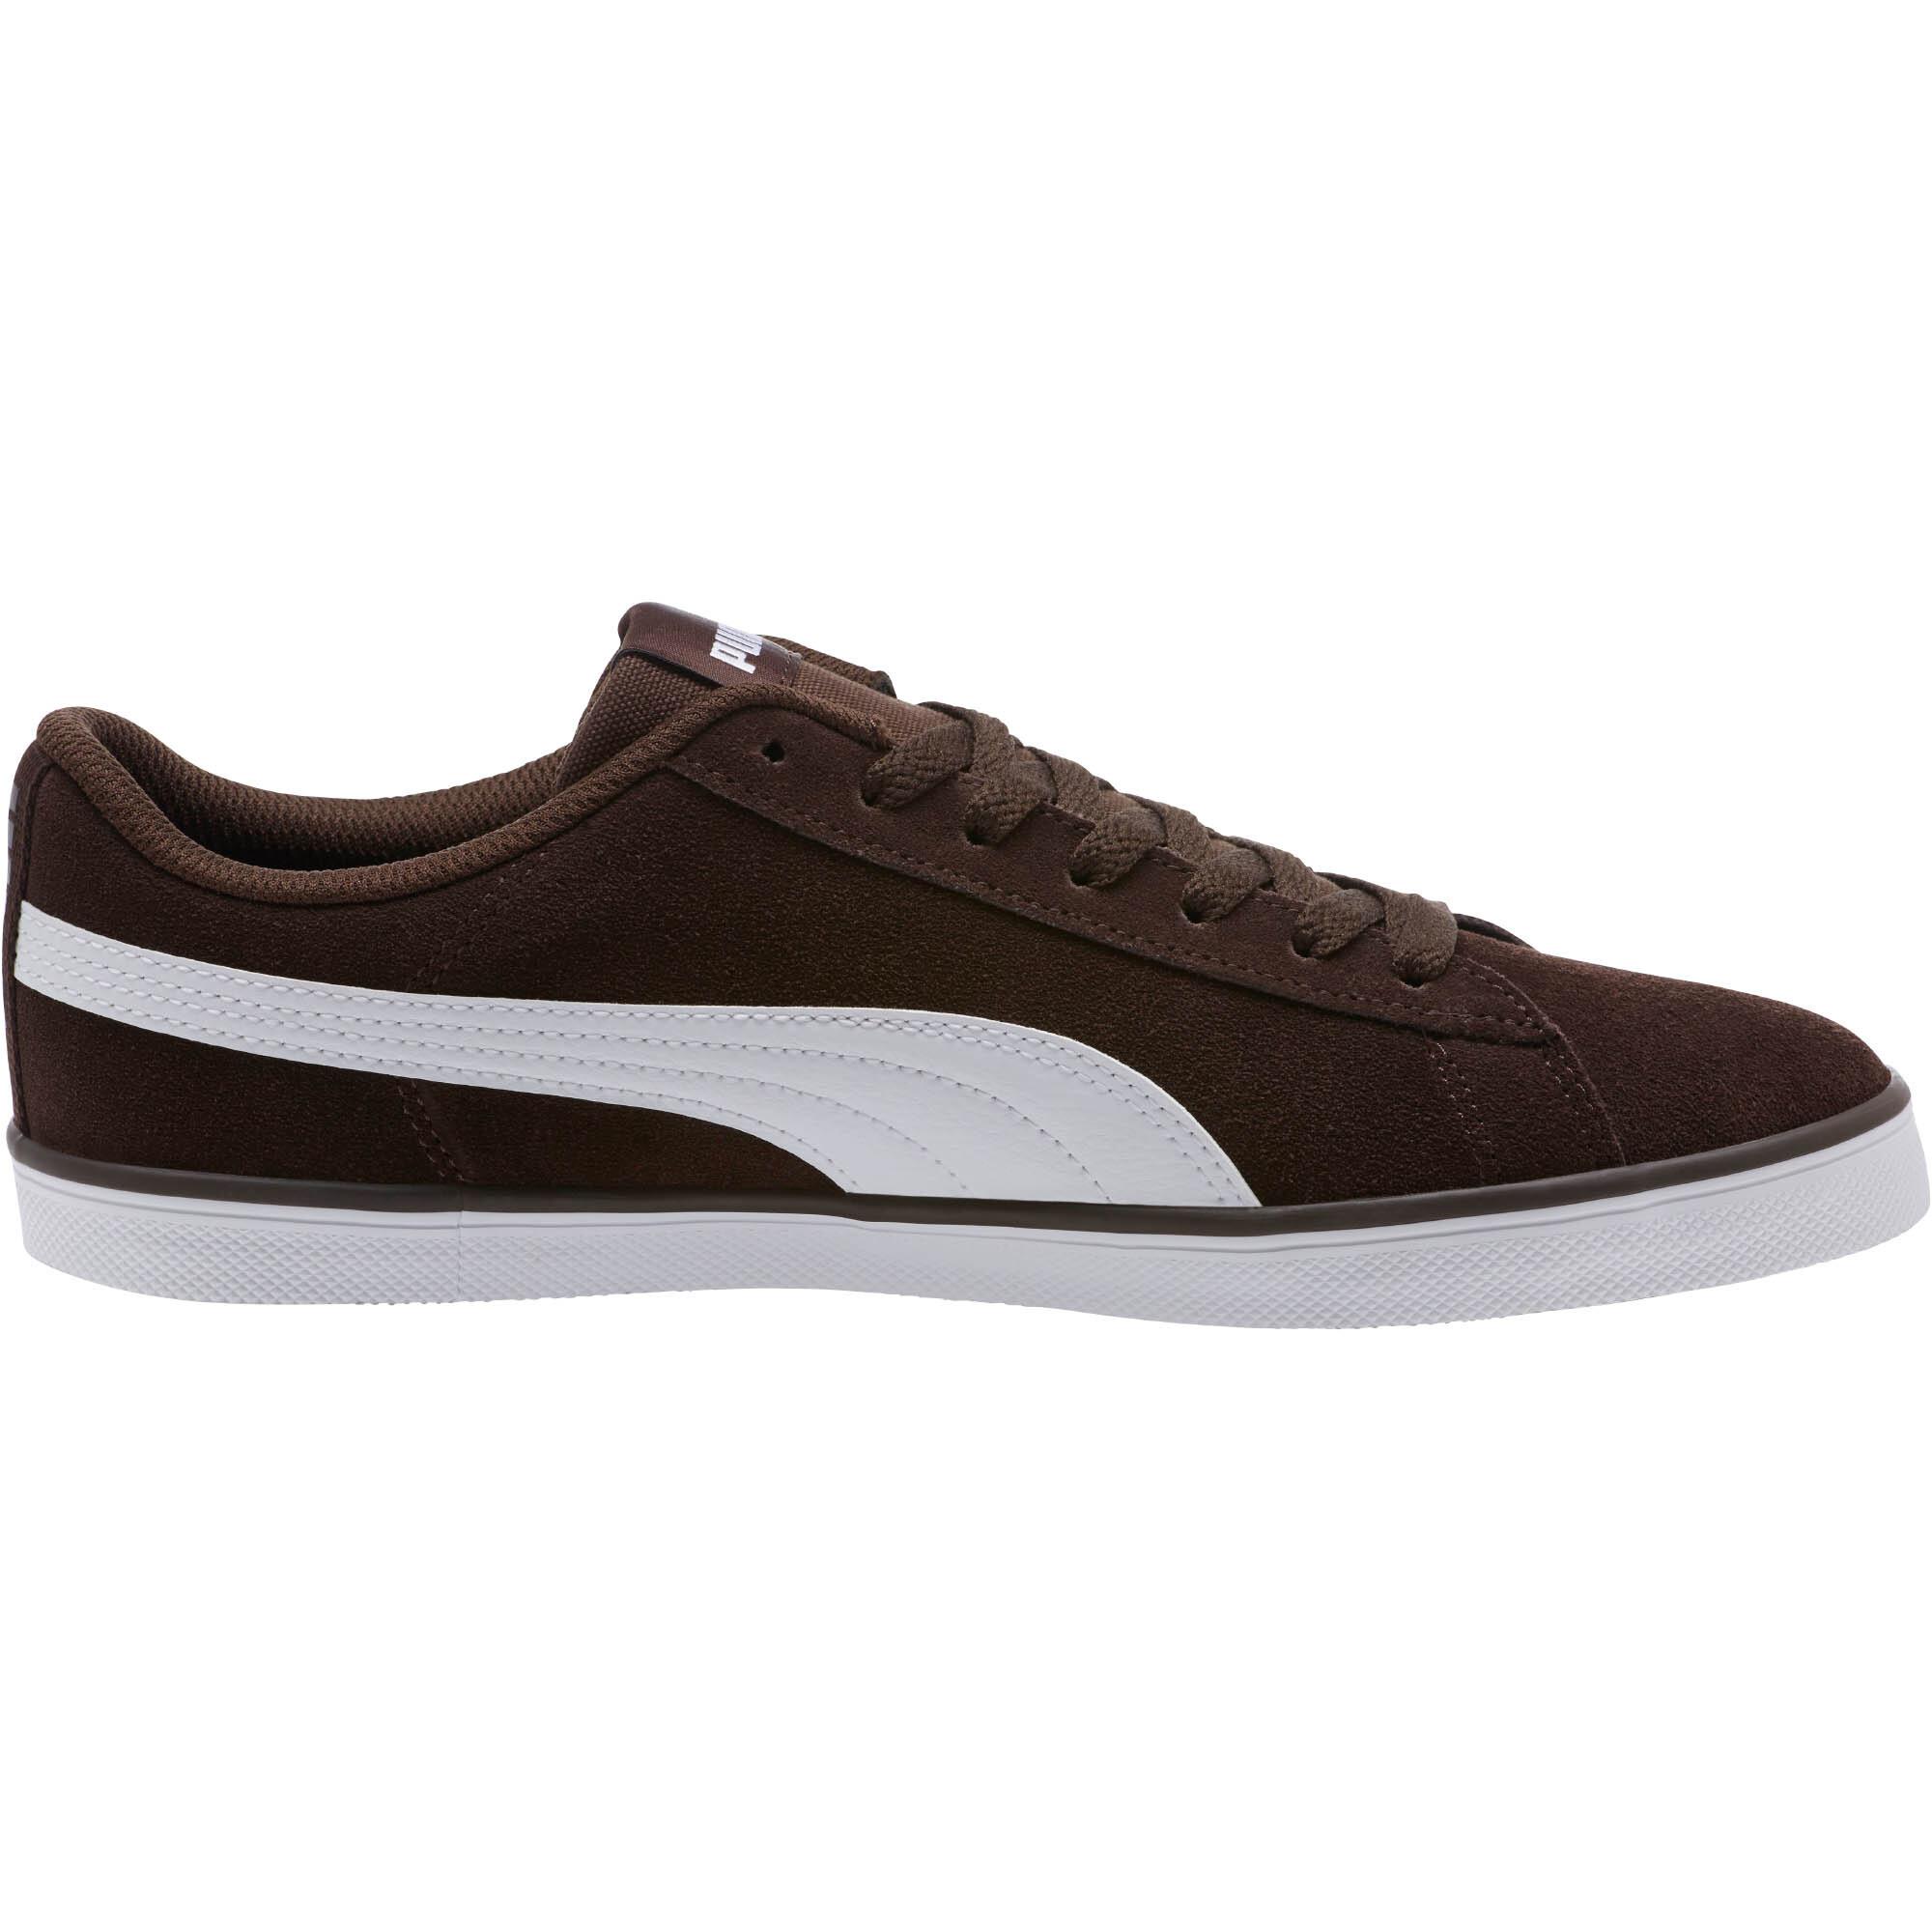 PUMA-Urban-Plus-Suede-Sneakers-Men-Shoe-Basics thumbnail 6